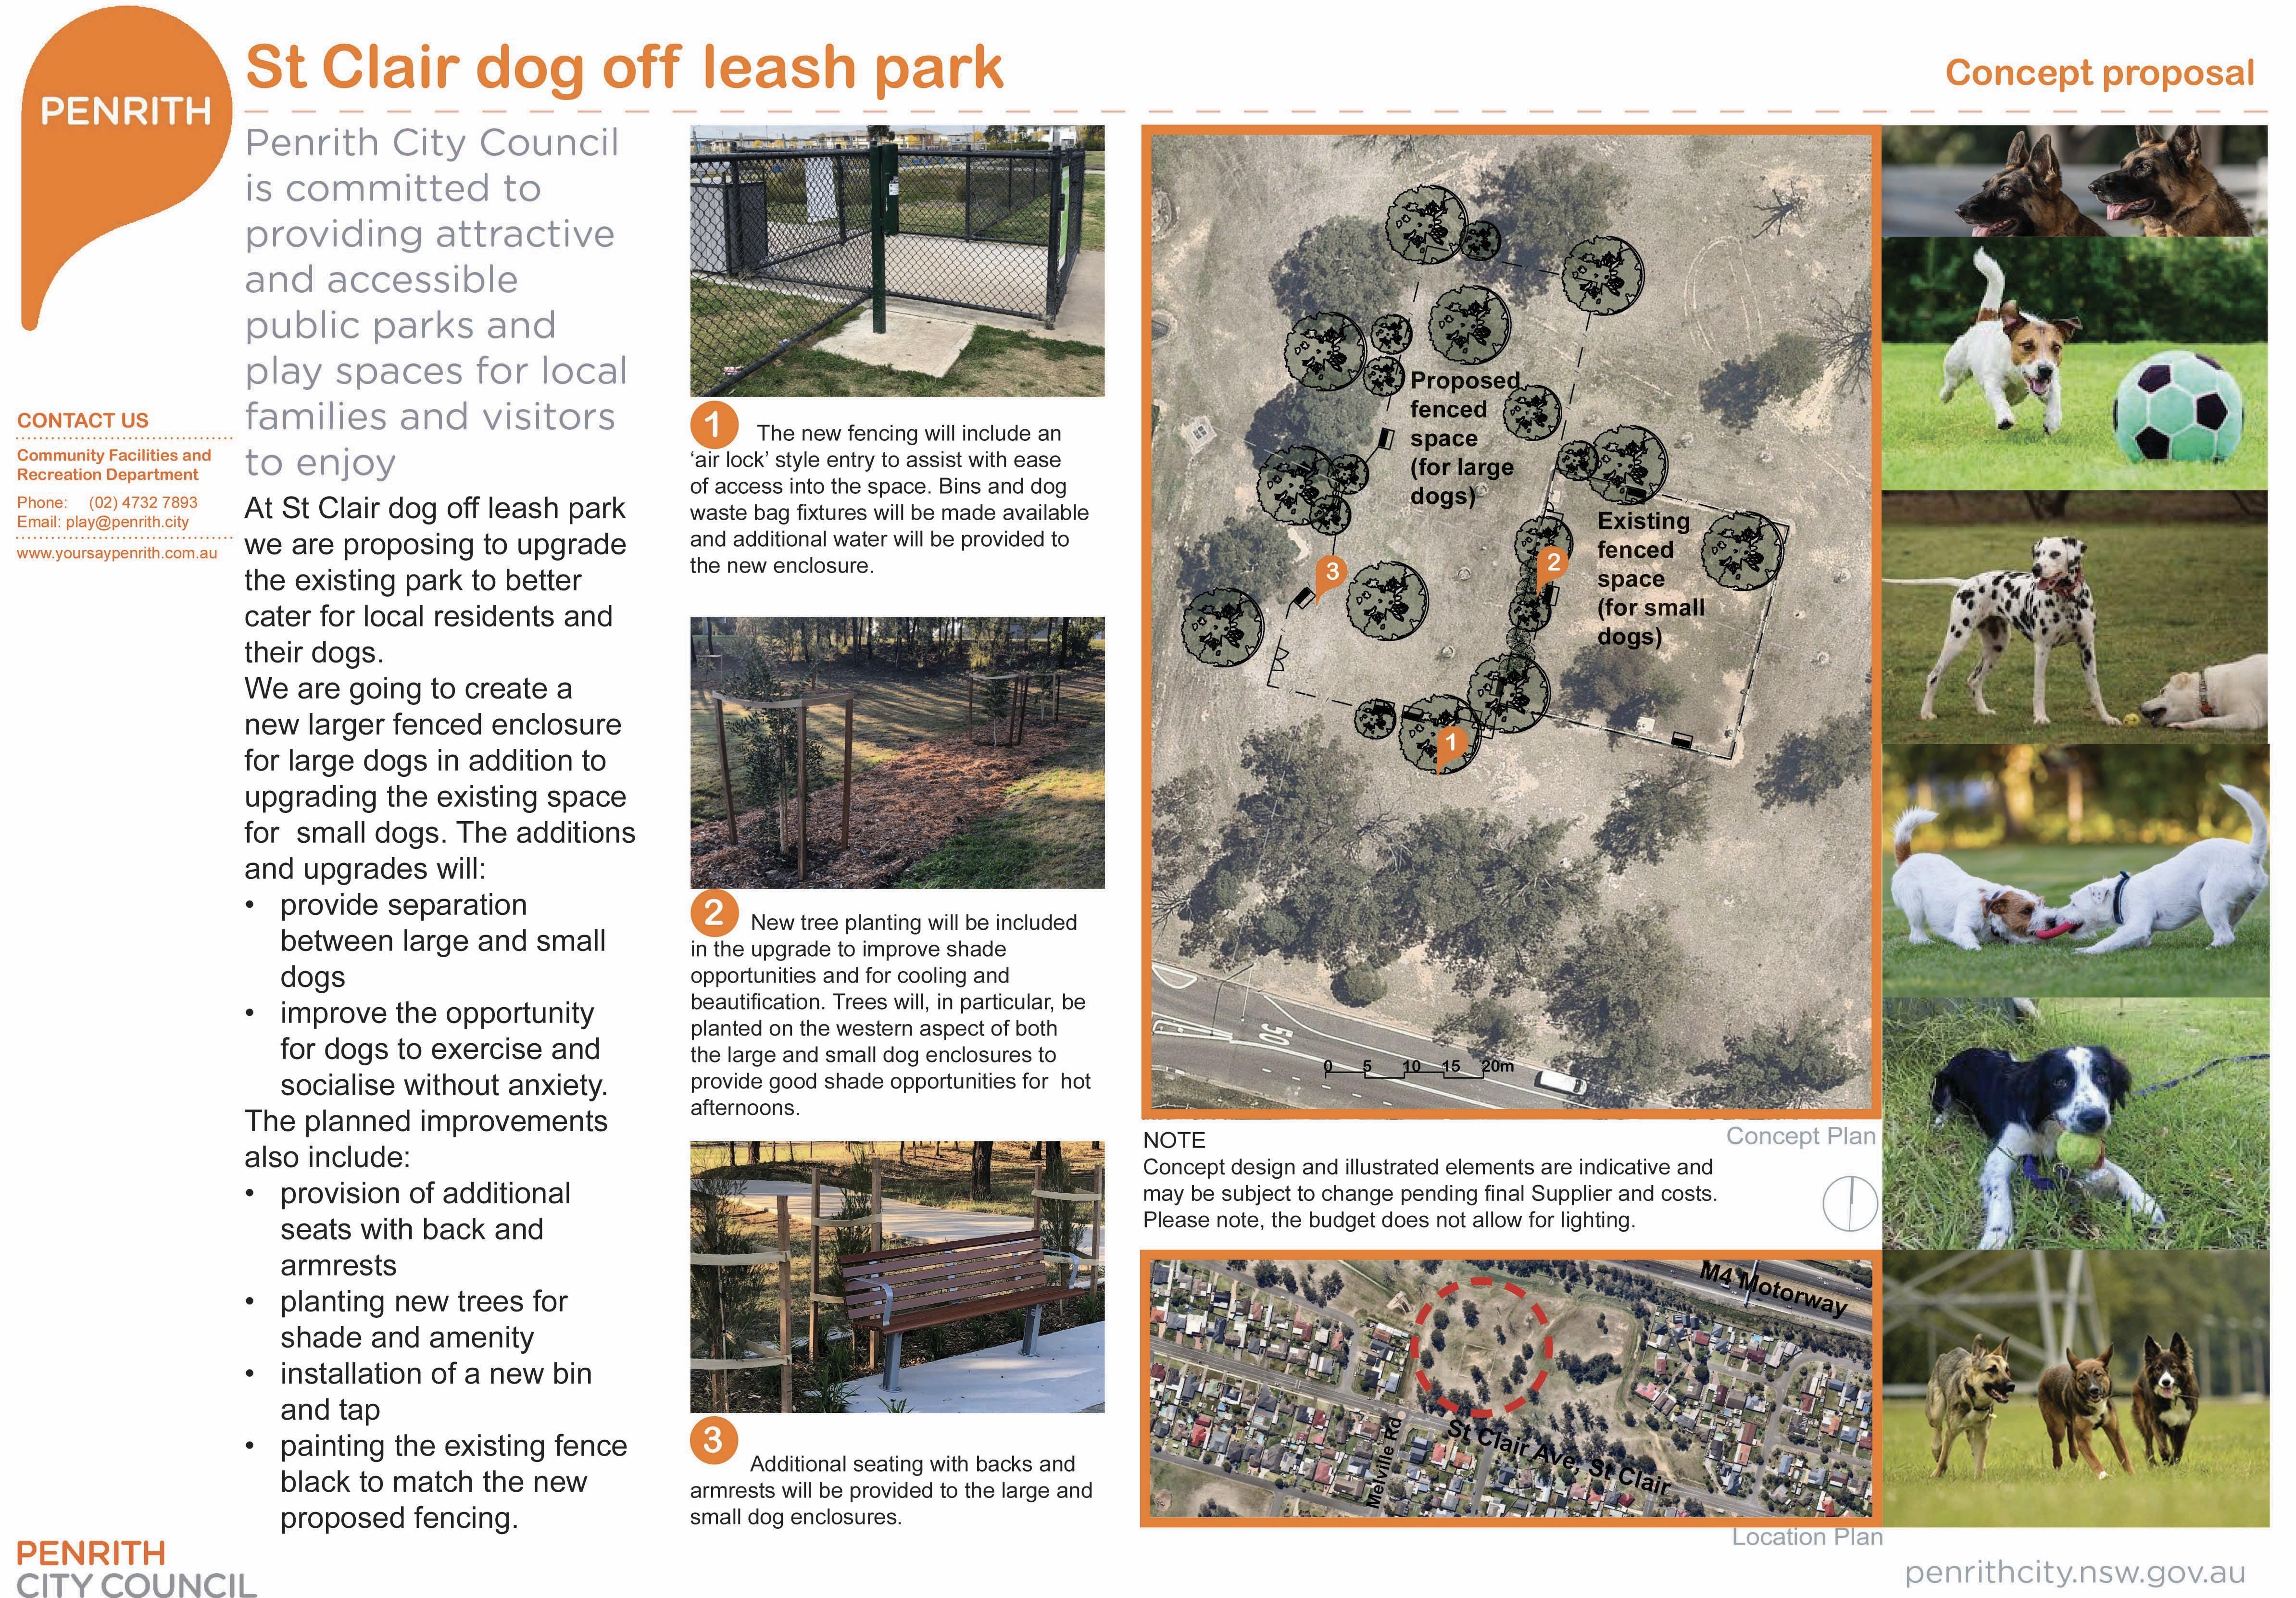 St Clair dog park HYS_draft Concept Plan V2.jpg